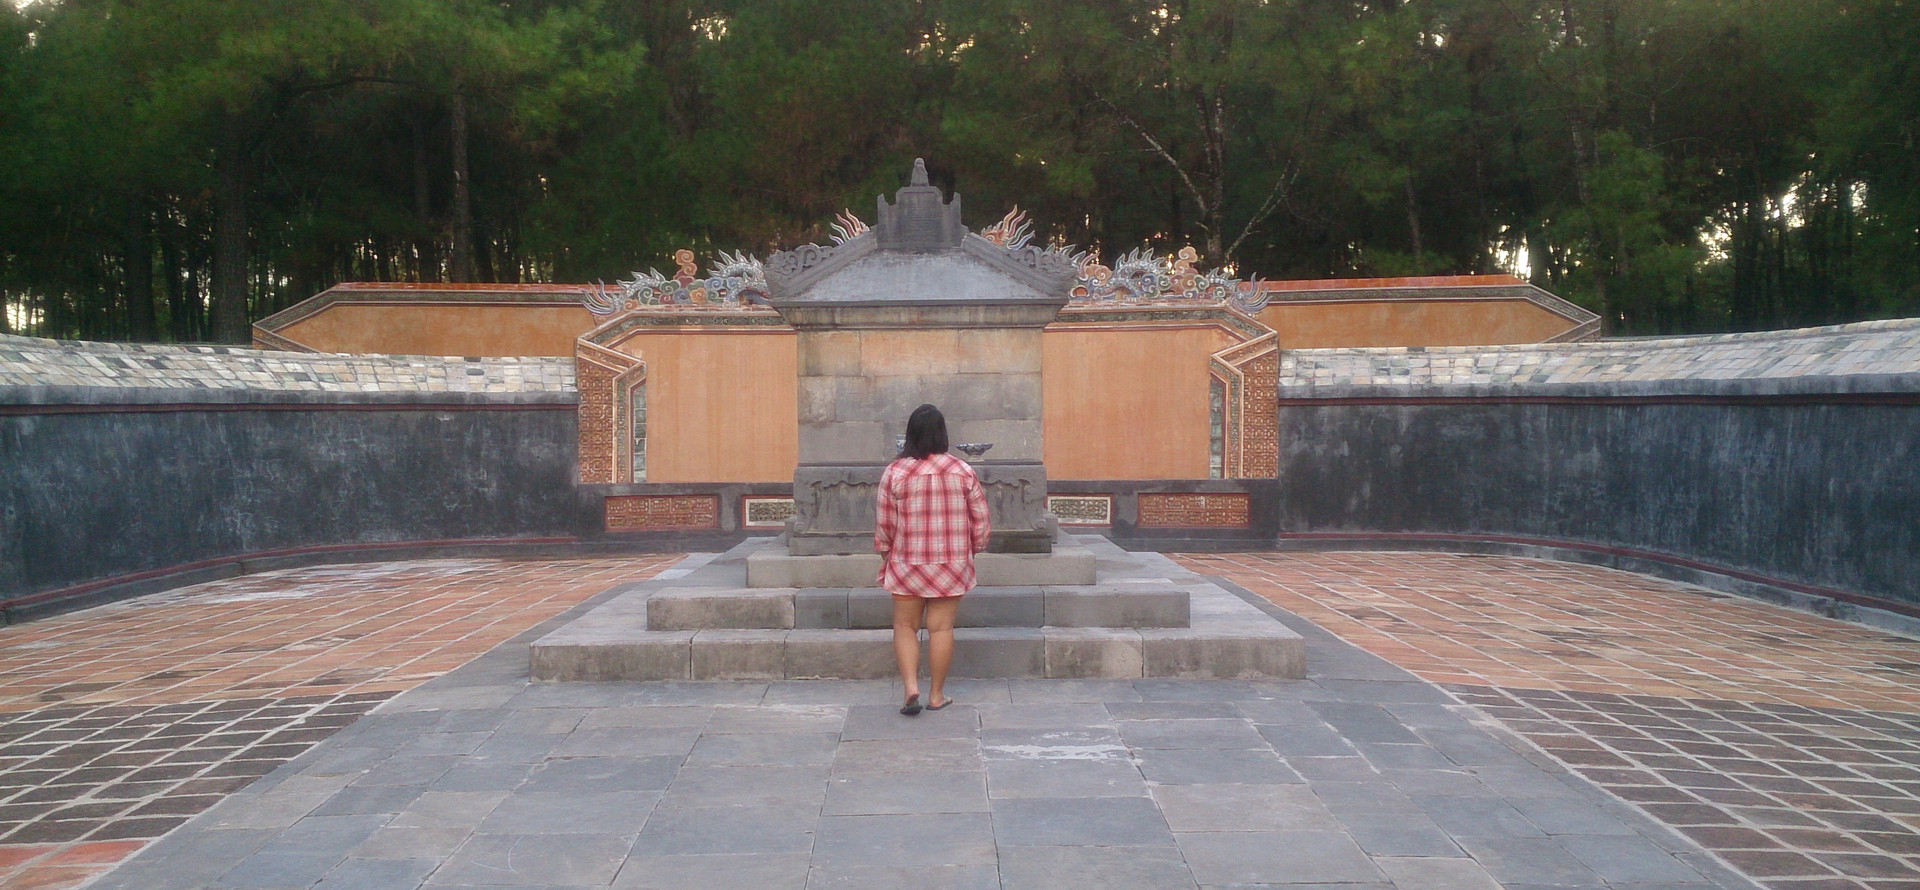 Explore The Majestic Tomb Of Tu Duc, Vietnamese Emperor